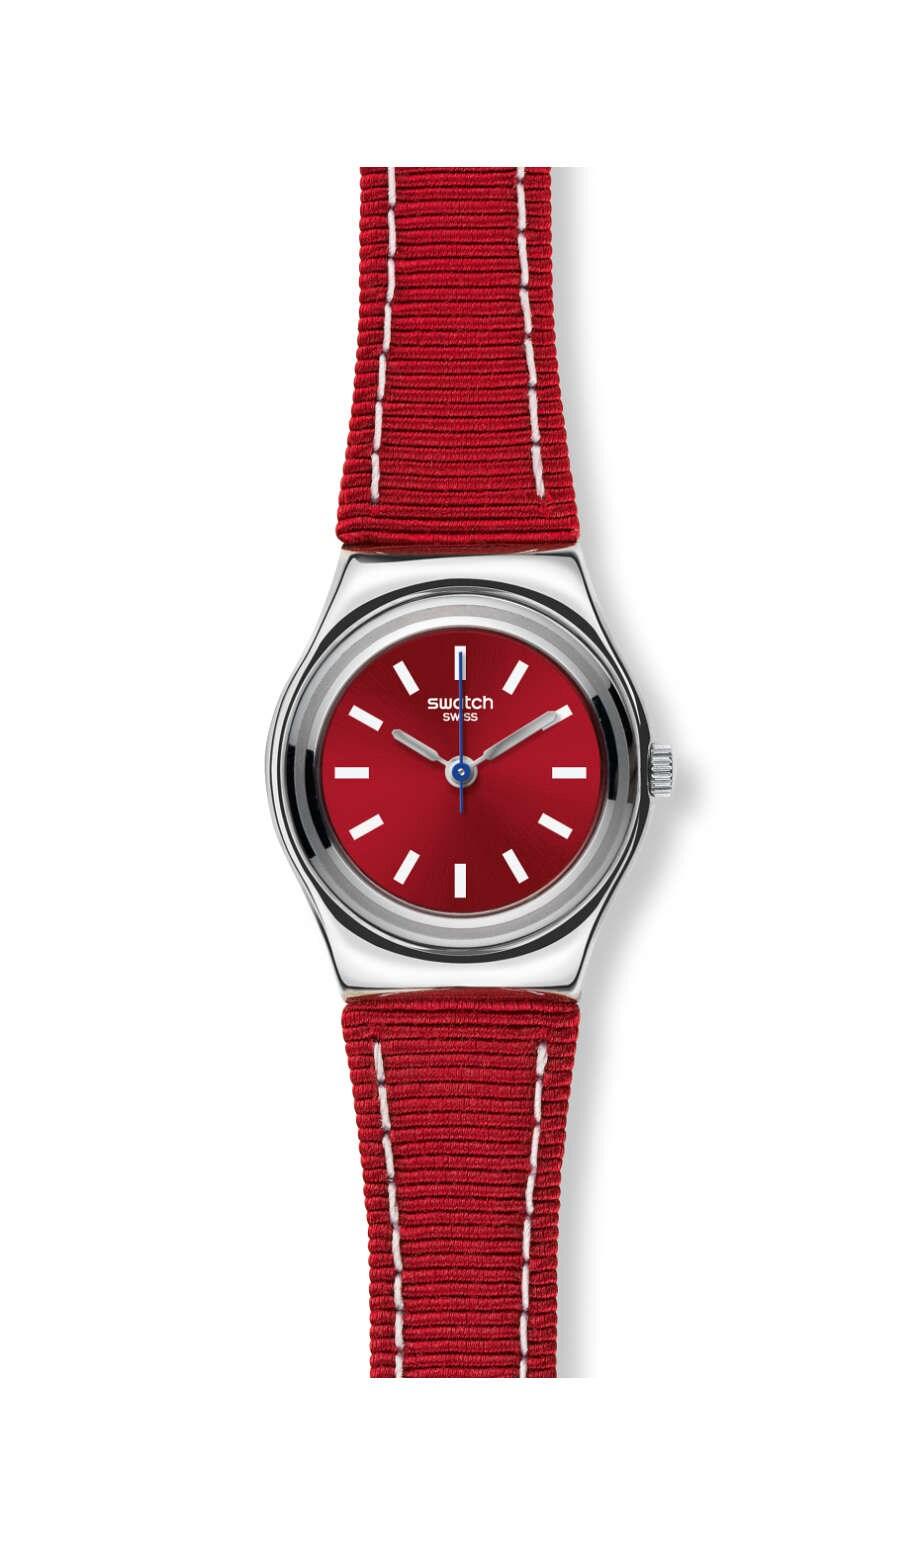 Swatch - RED STREET WRIST - 1